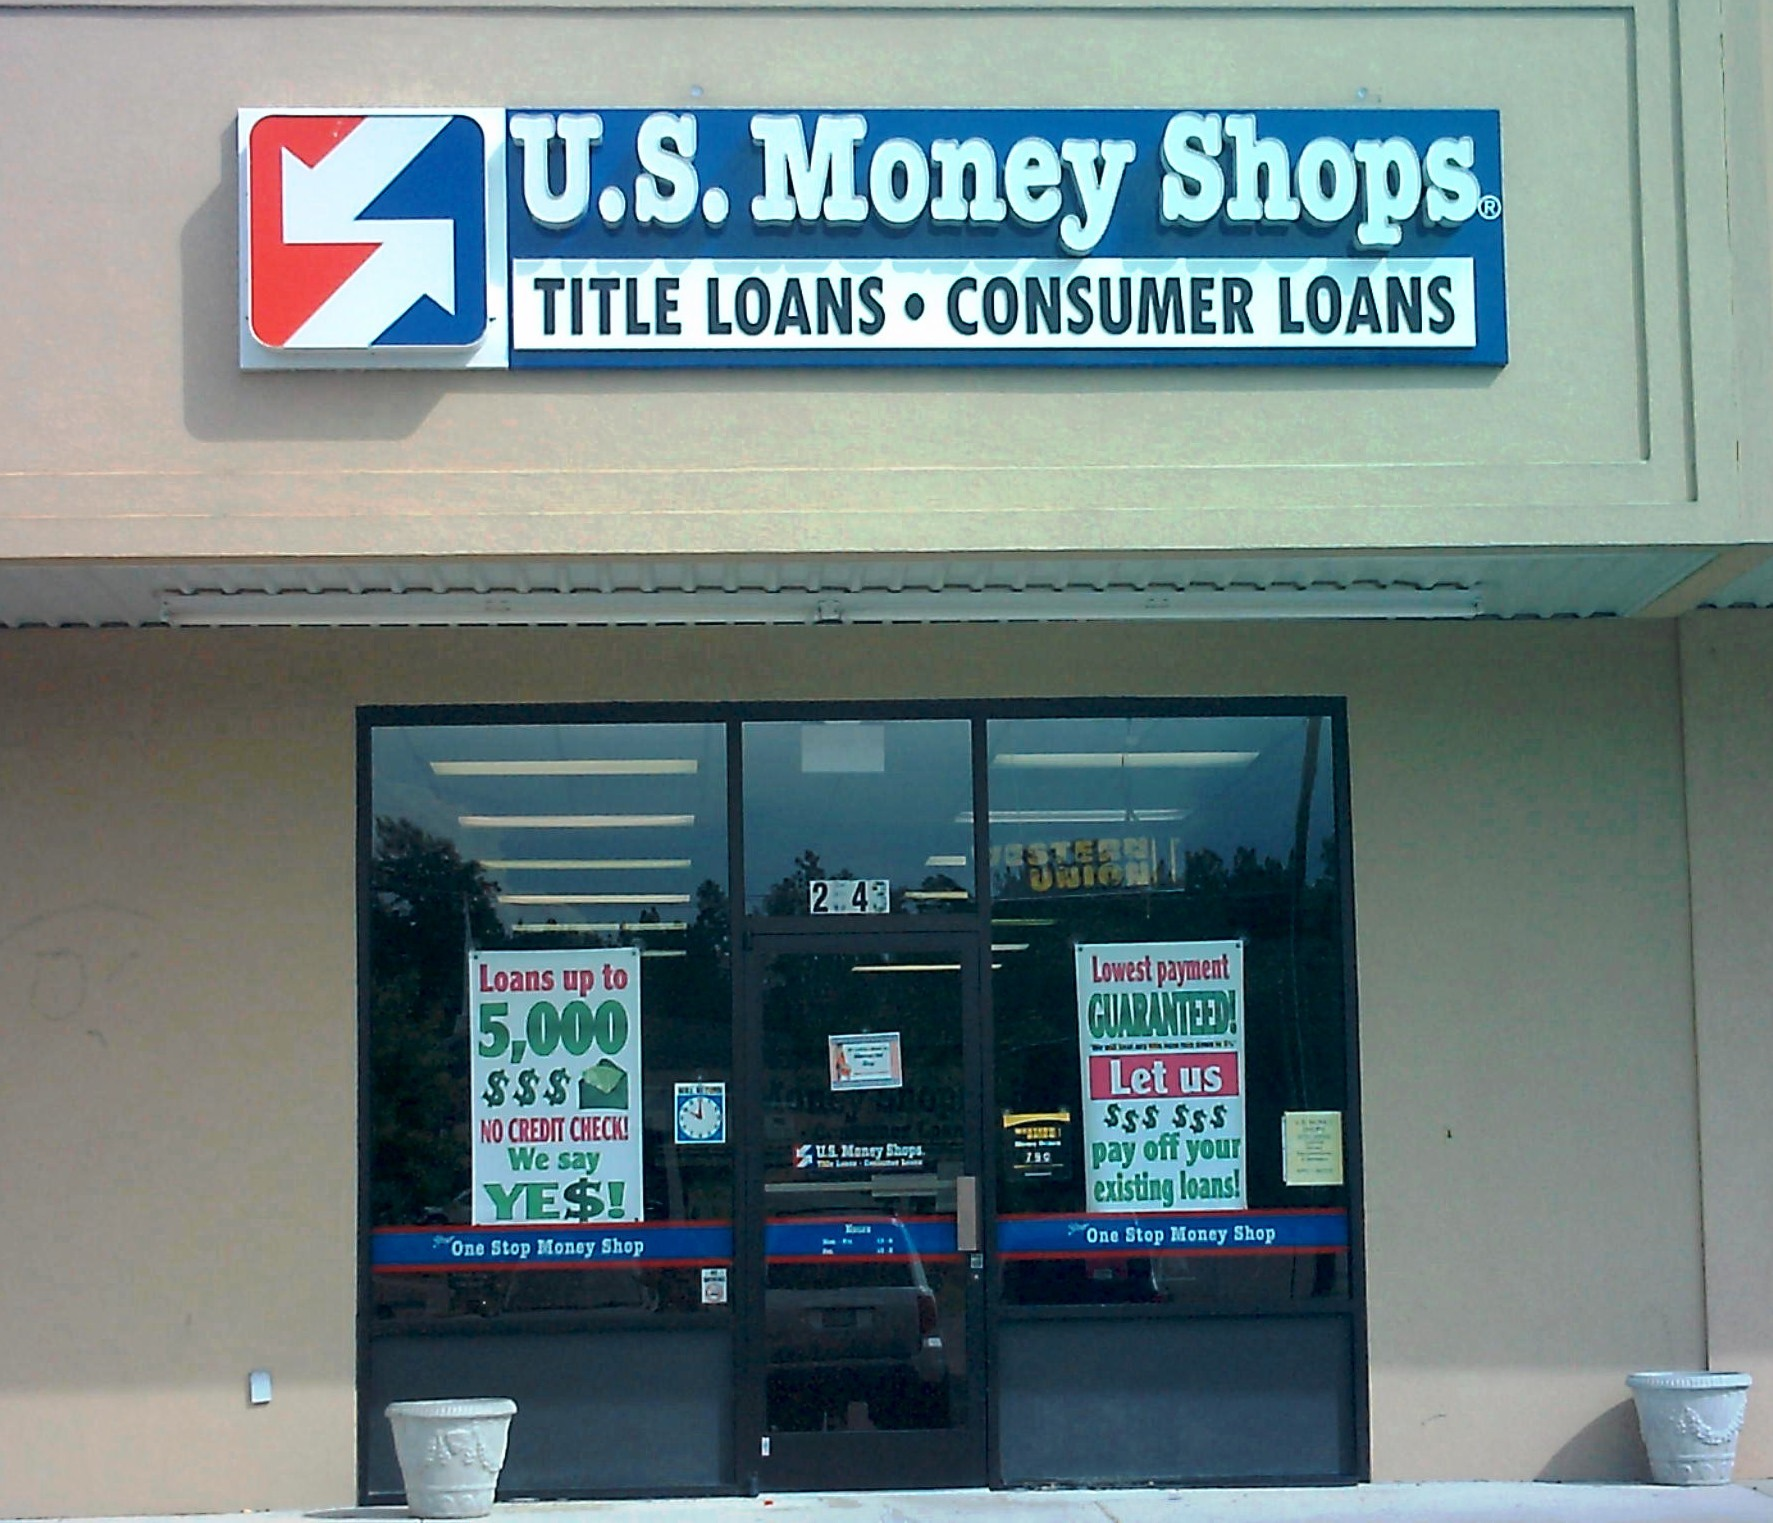 U.S. Money Shops Title Loans